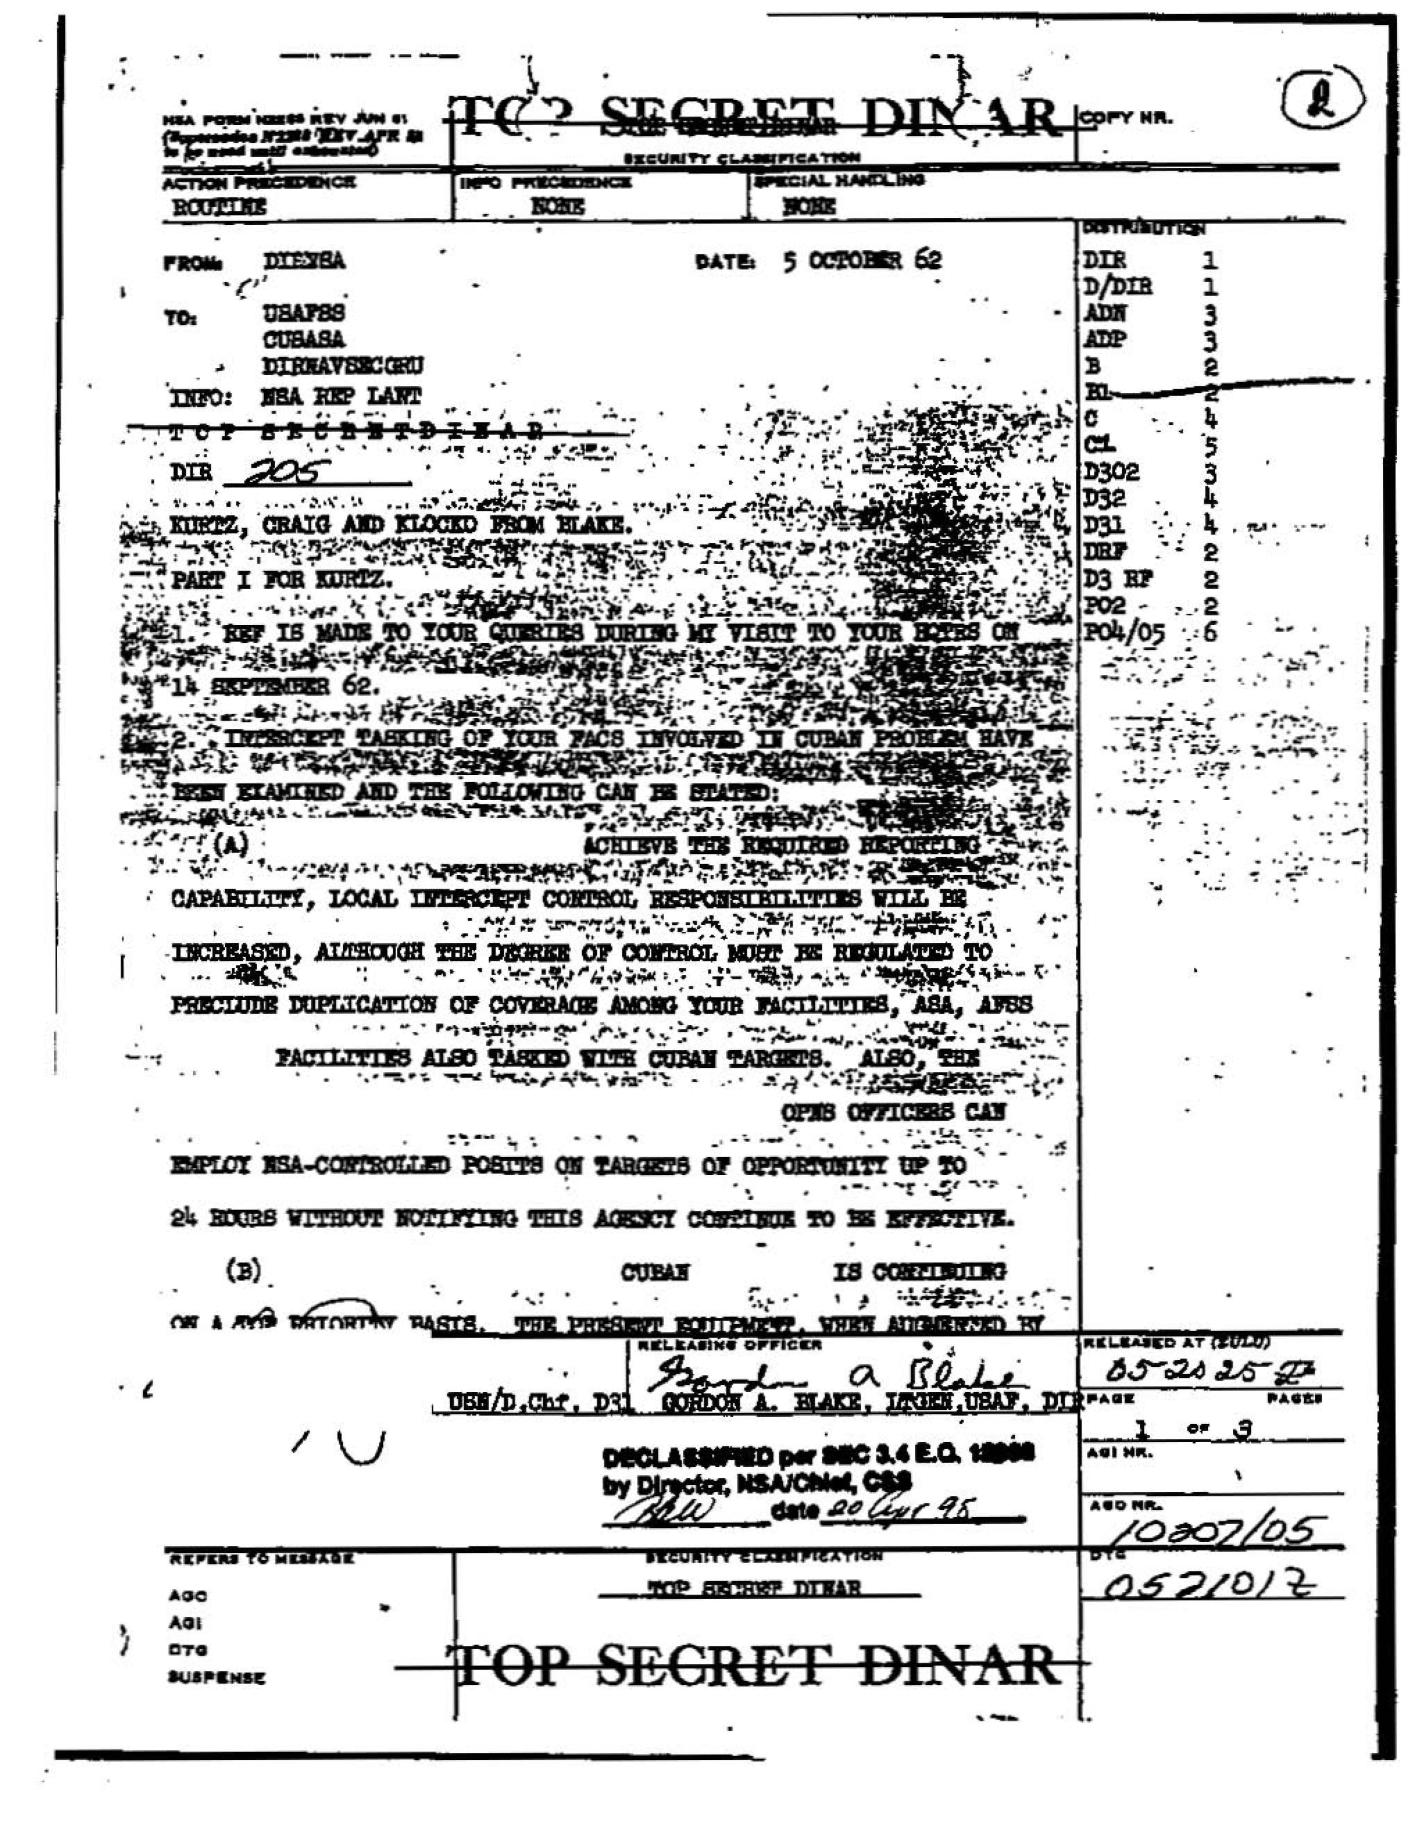 5_OCTOBER_DIRNSA_MESSAGE.PDF